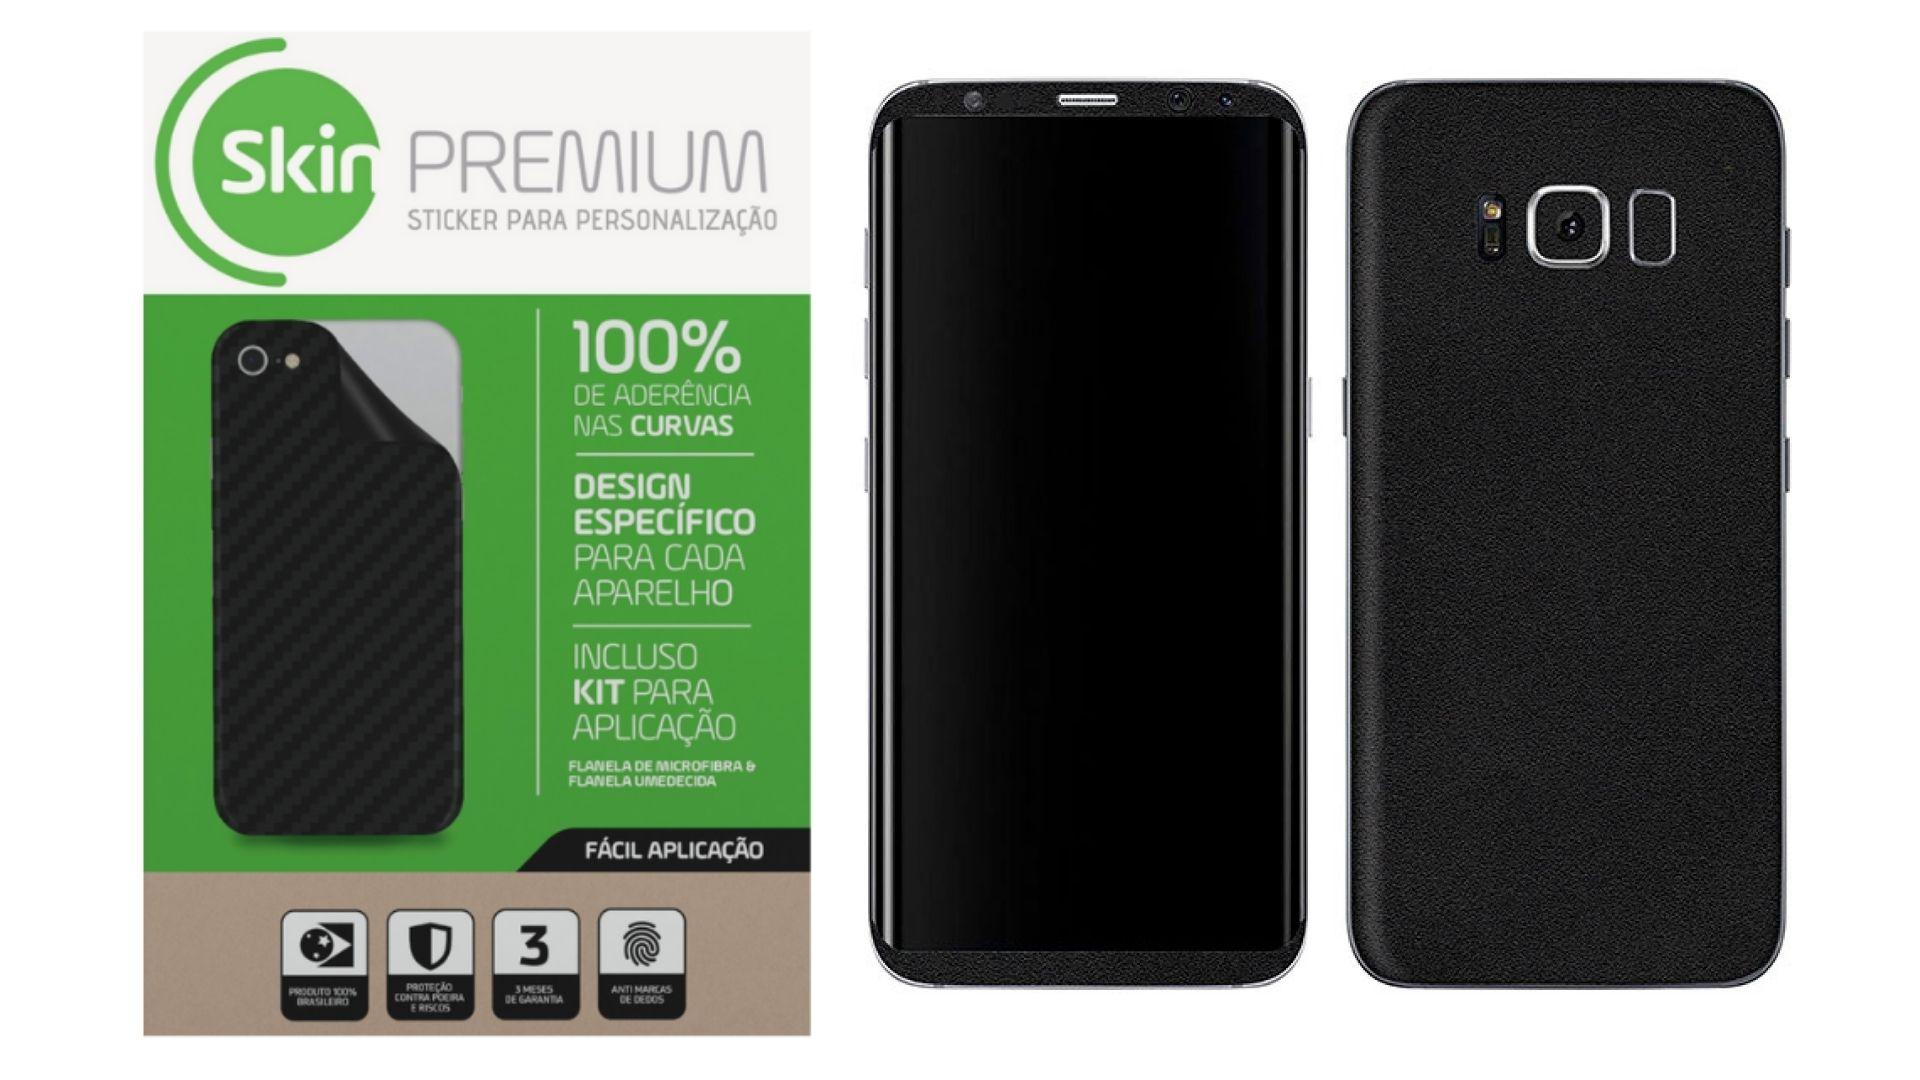 Skin Premium Jateado Fosco Verso e Laterais para Samsung Galaxy S8